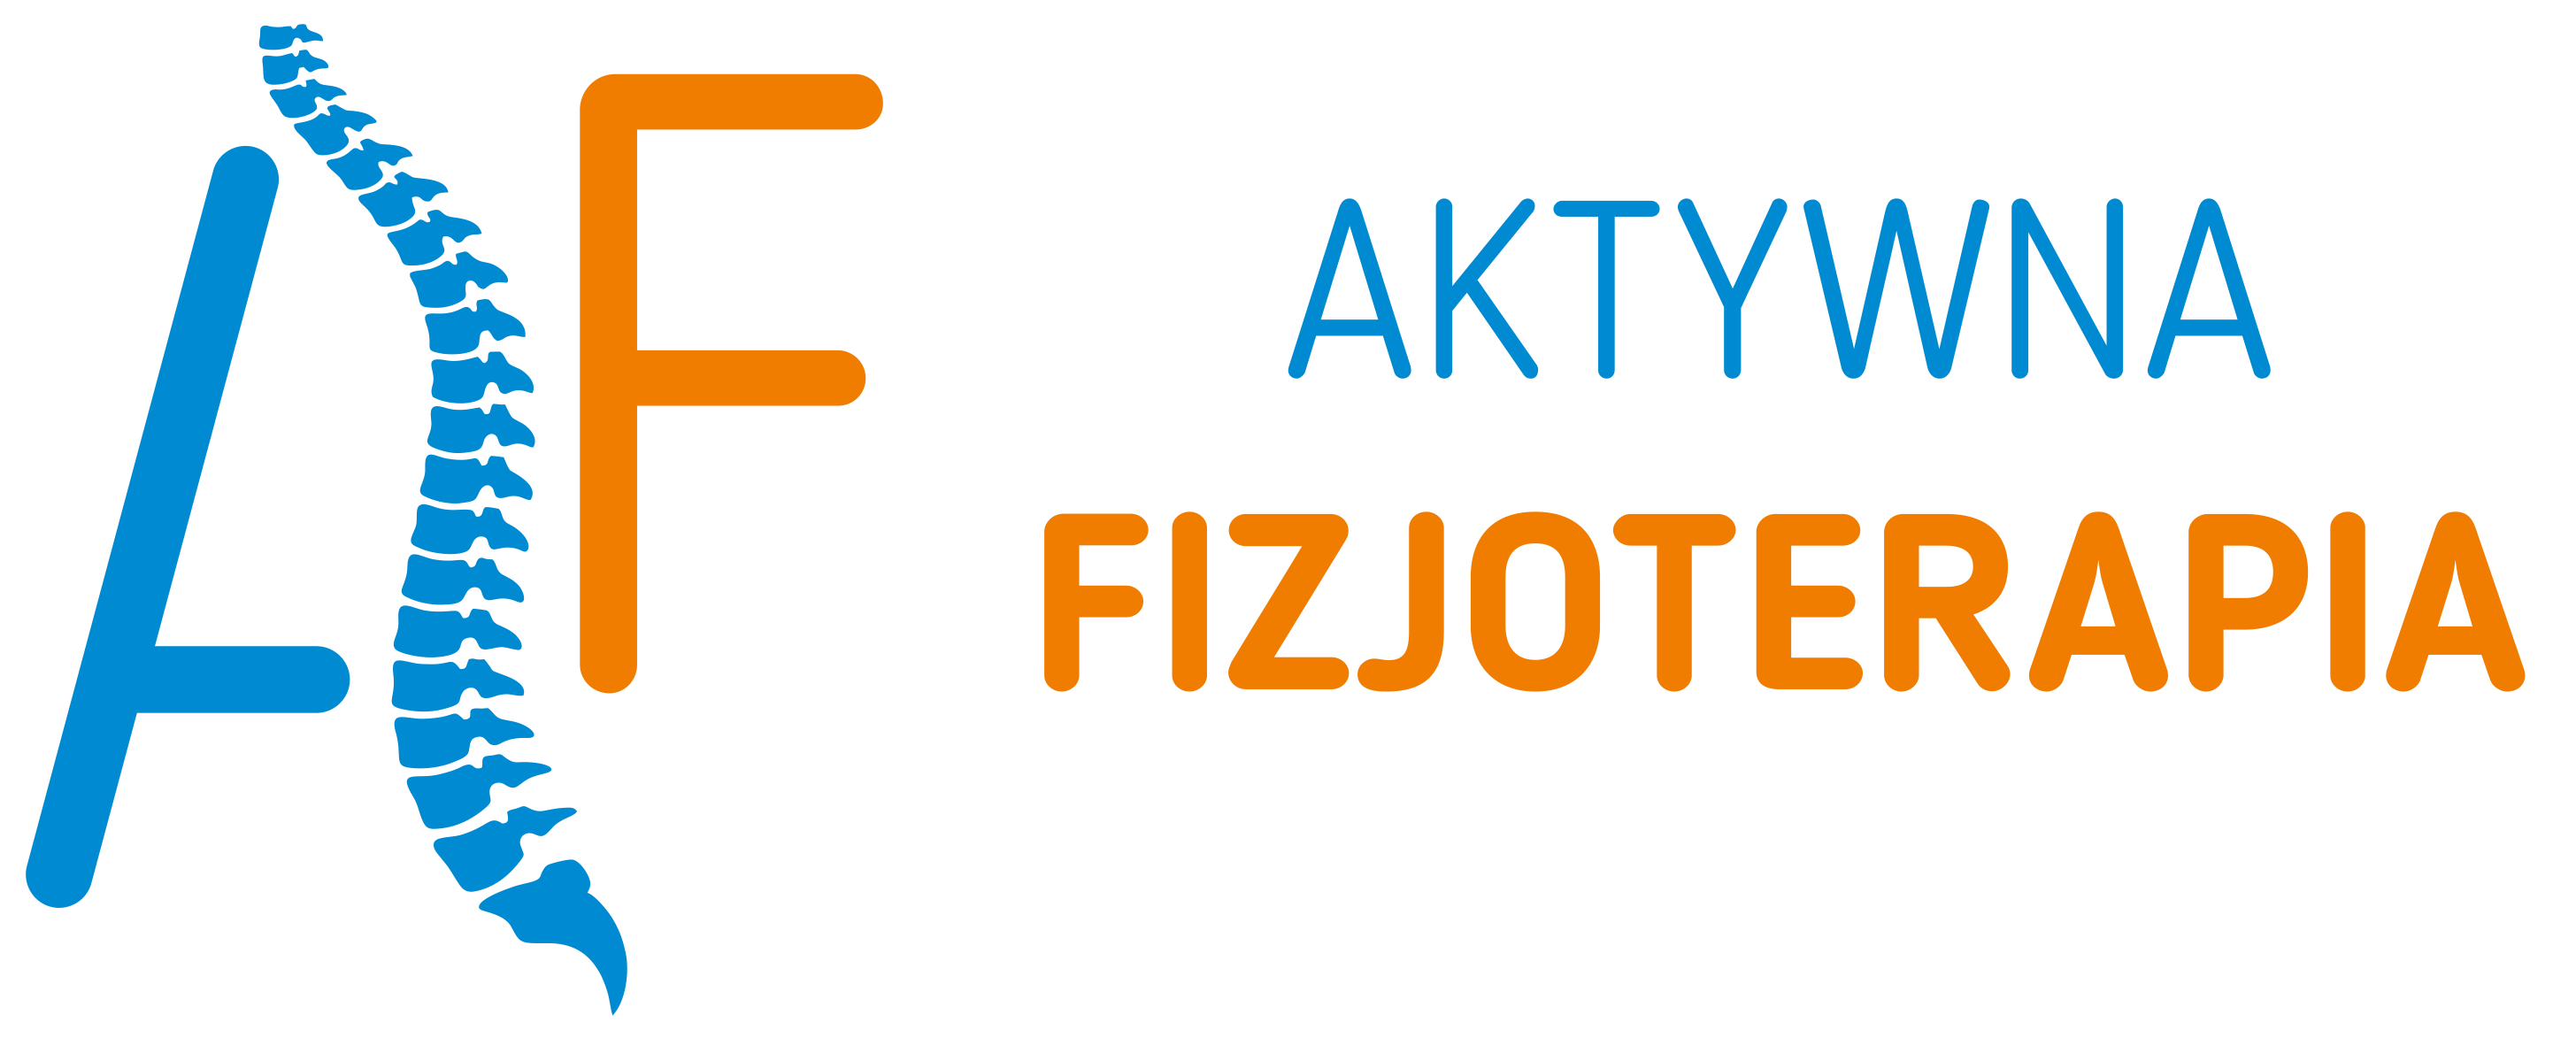 Aktywna Fizjoterapia